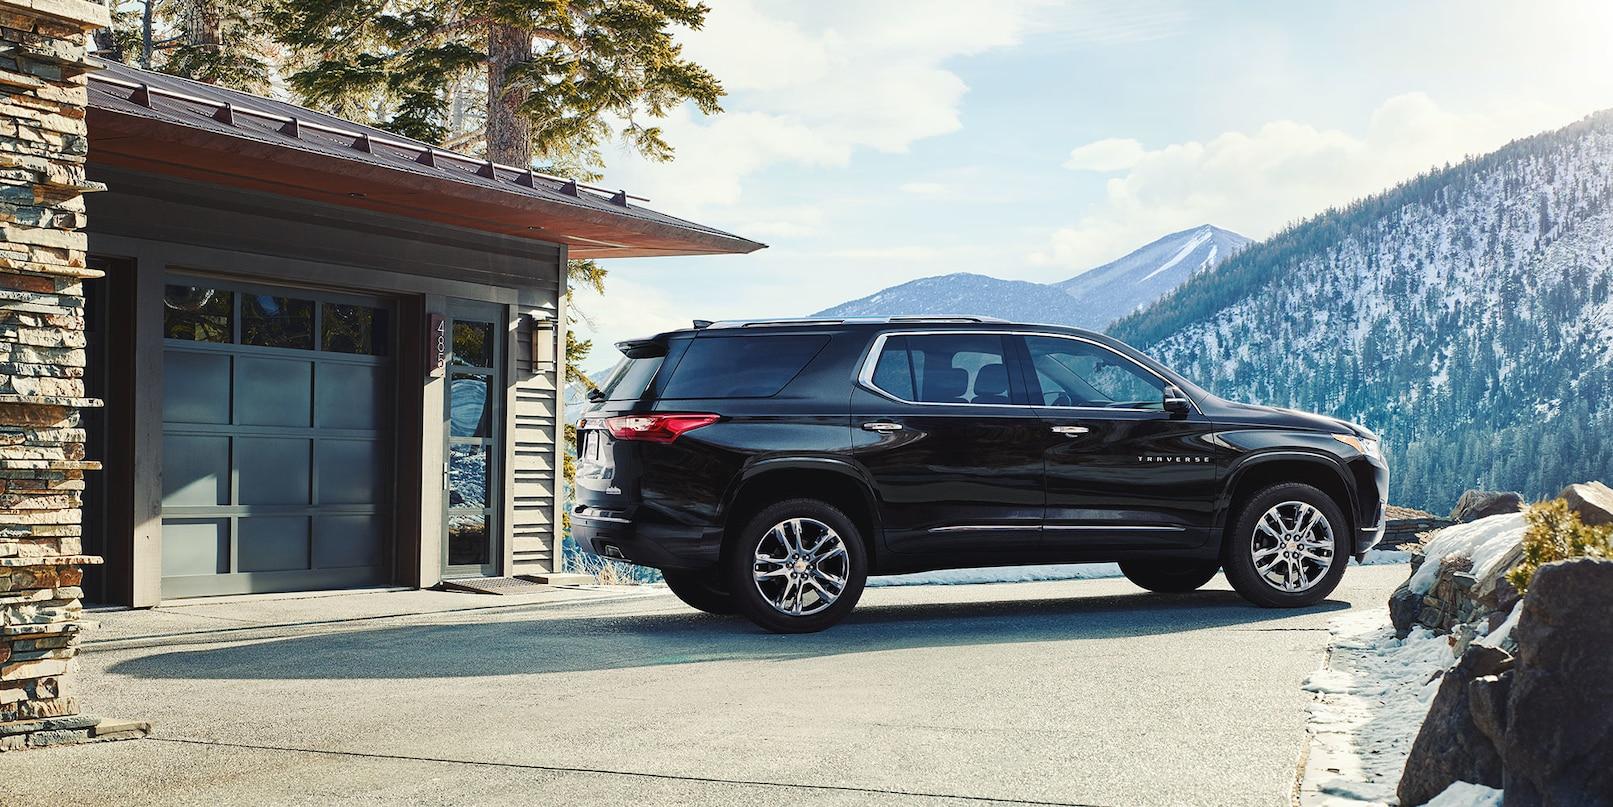 2019 Chevrolet Traverse for Sale near Valparaiso, IN